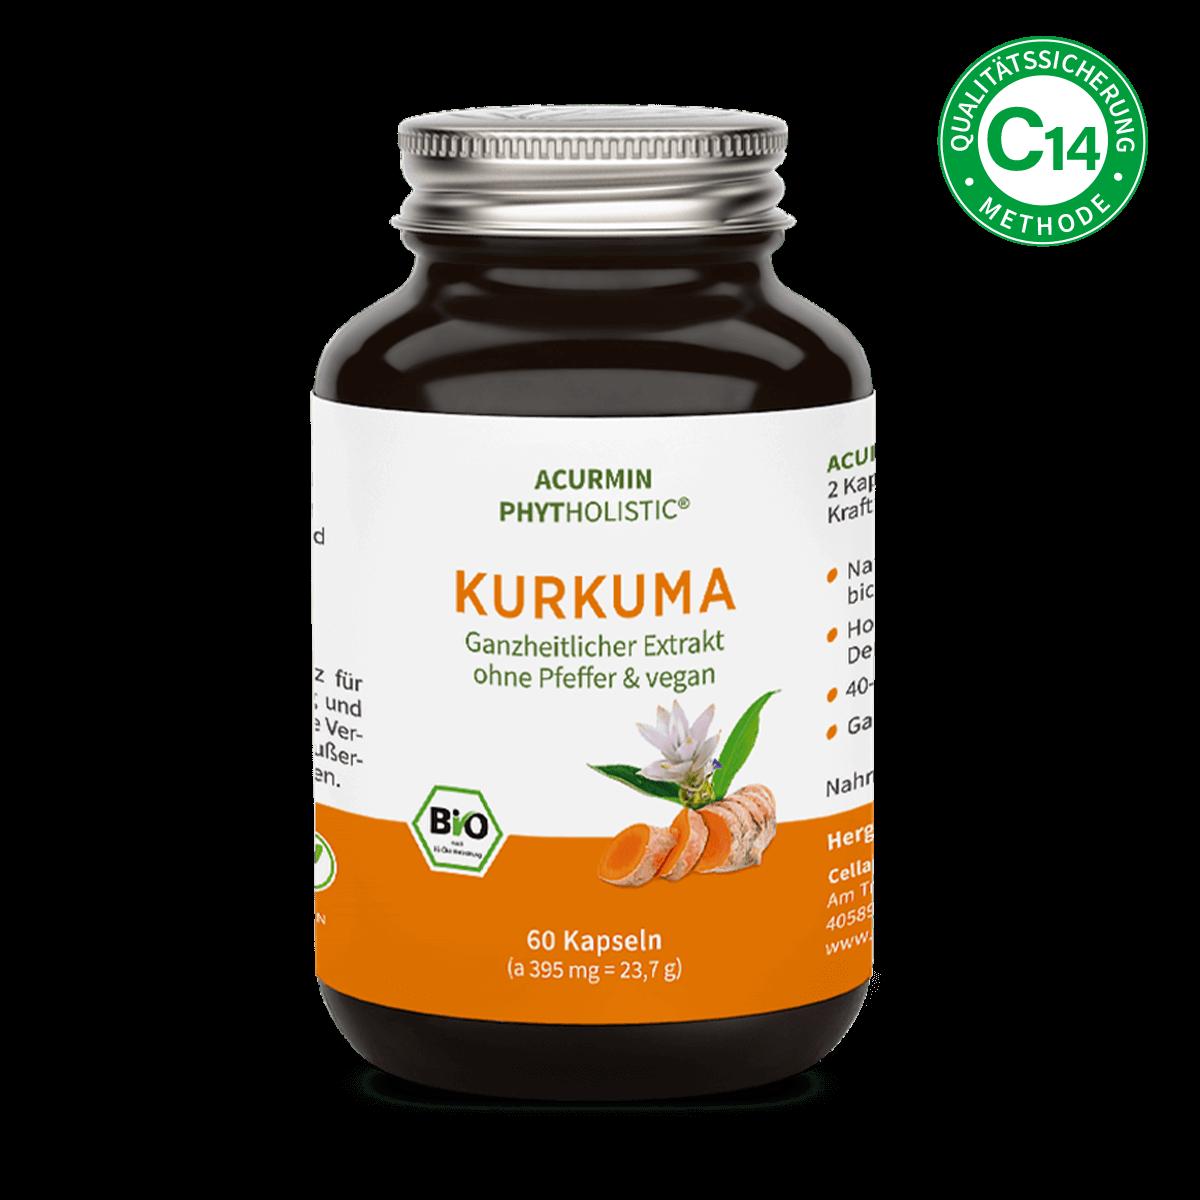 kurkuma-kapseln-bio-acurmin-phytholistic-60-stueck-glas-vorne-mit-siegel-1200x1200